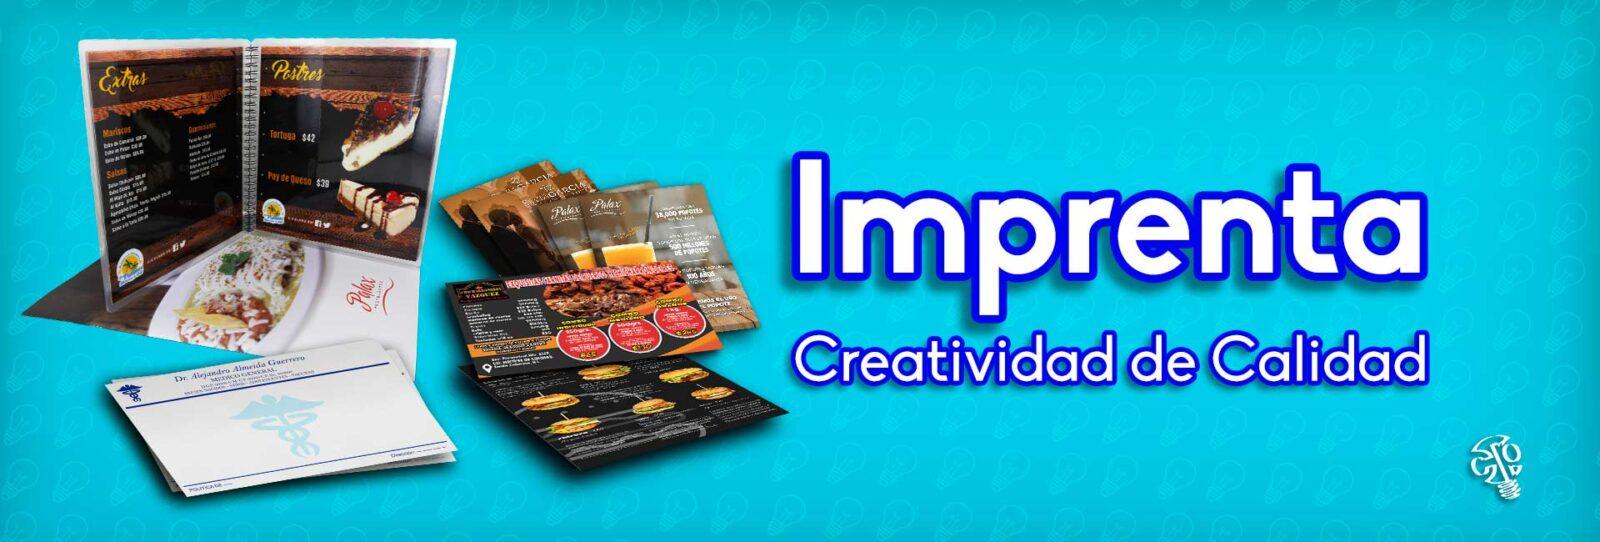 imprenta_creatividad